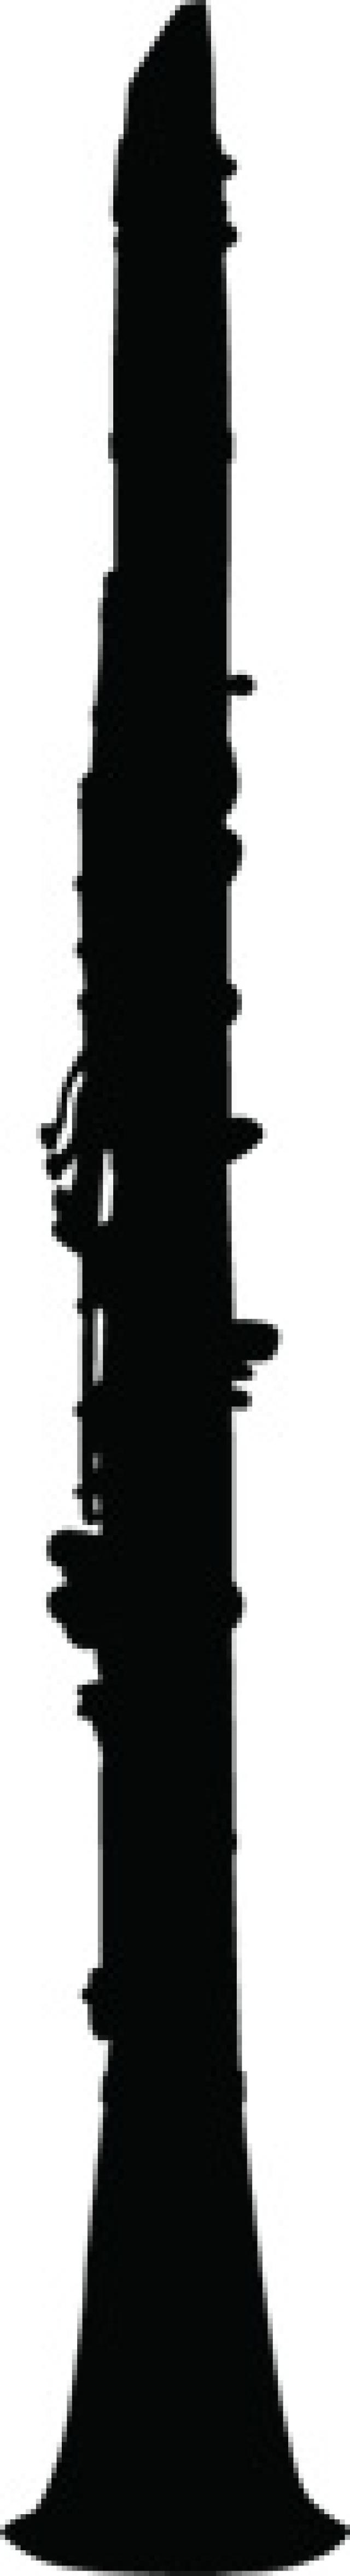 640x4706 Trombone Silhouette